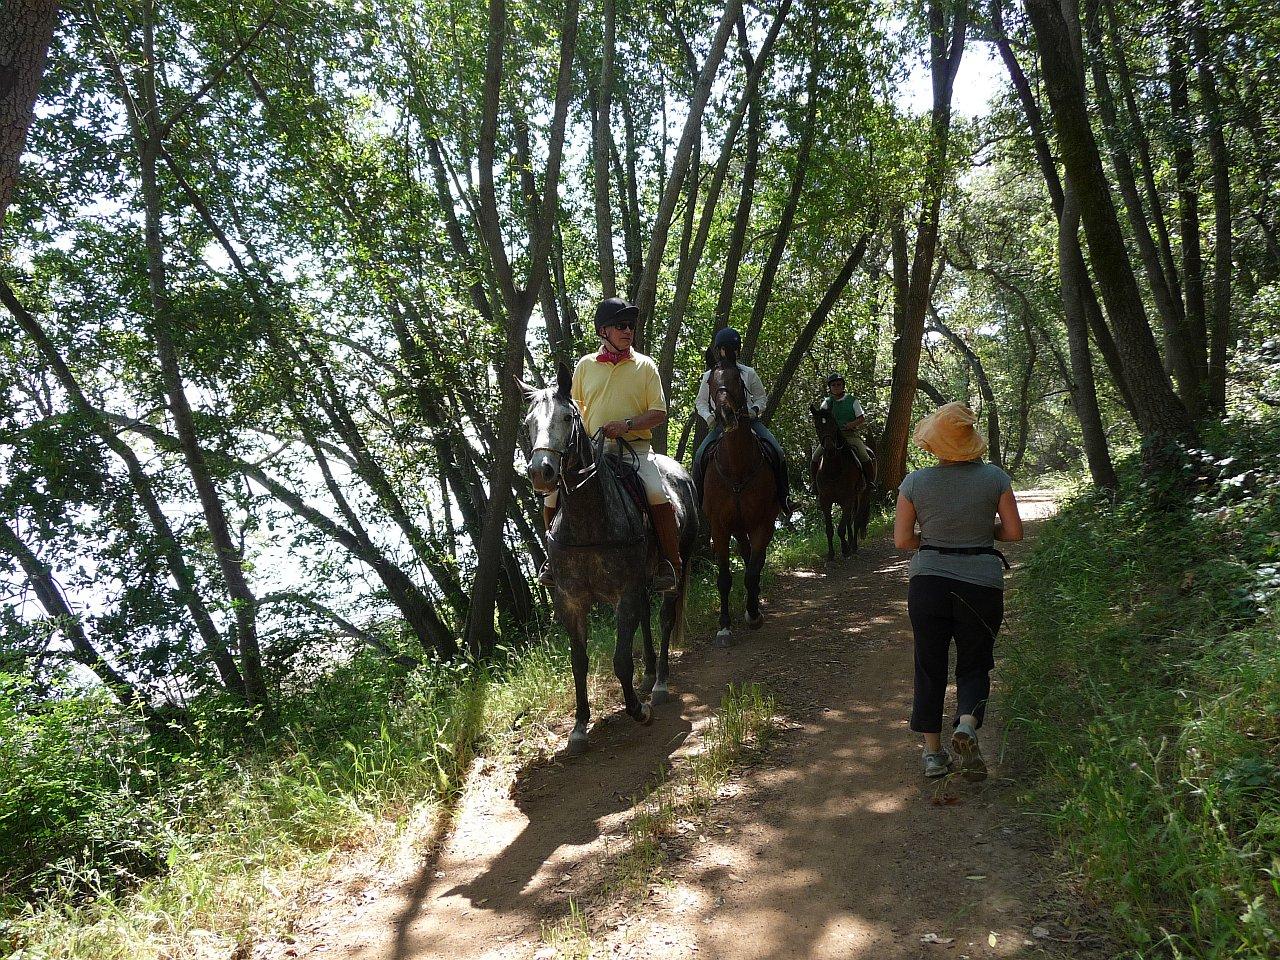 Rush Creek horses n hikers 1280 webop.jpg